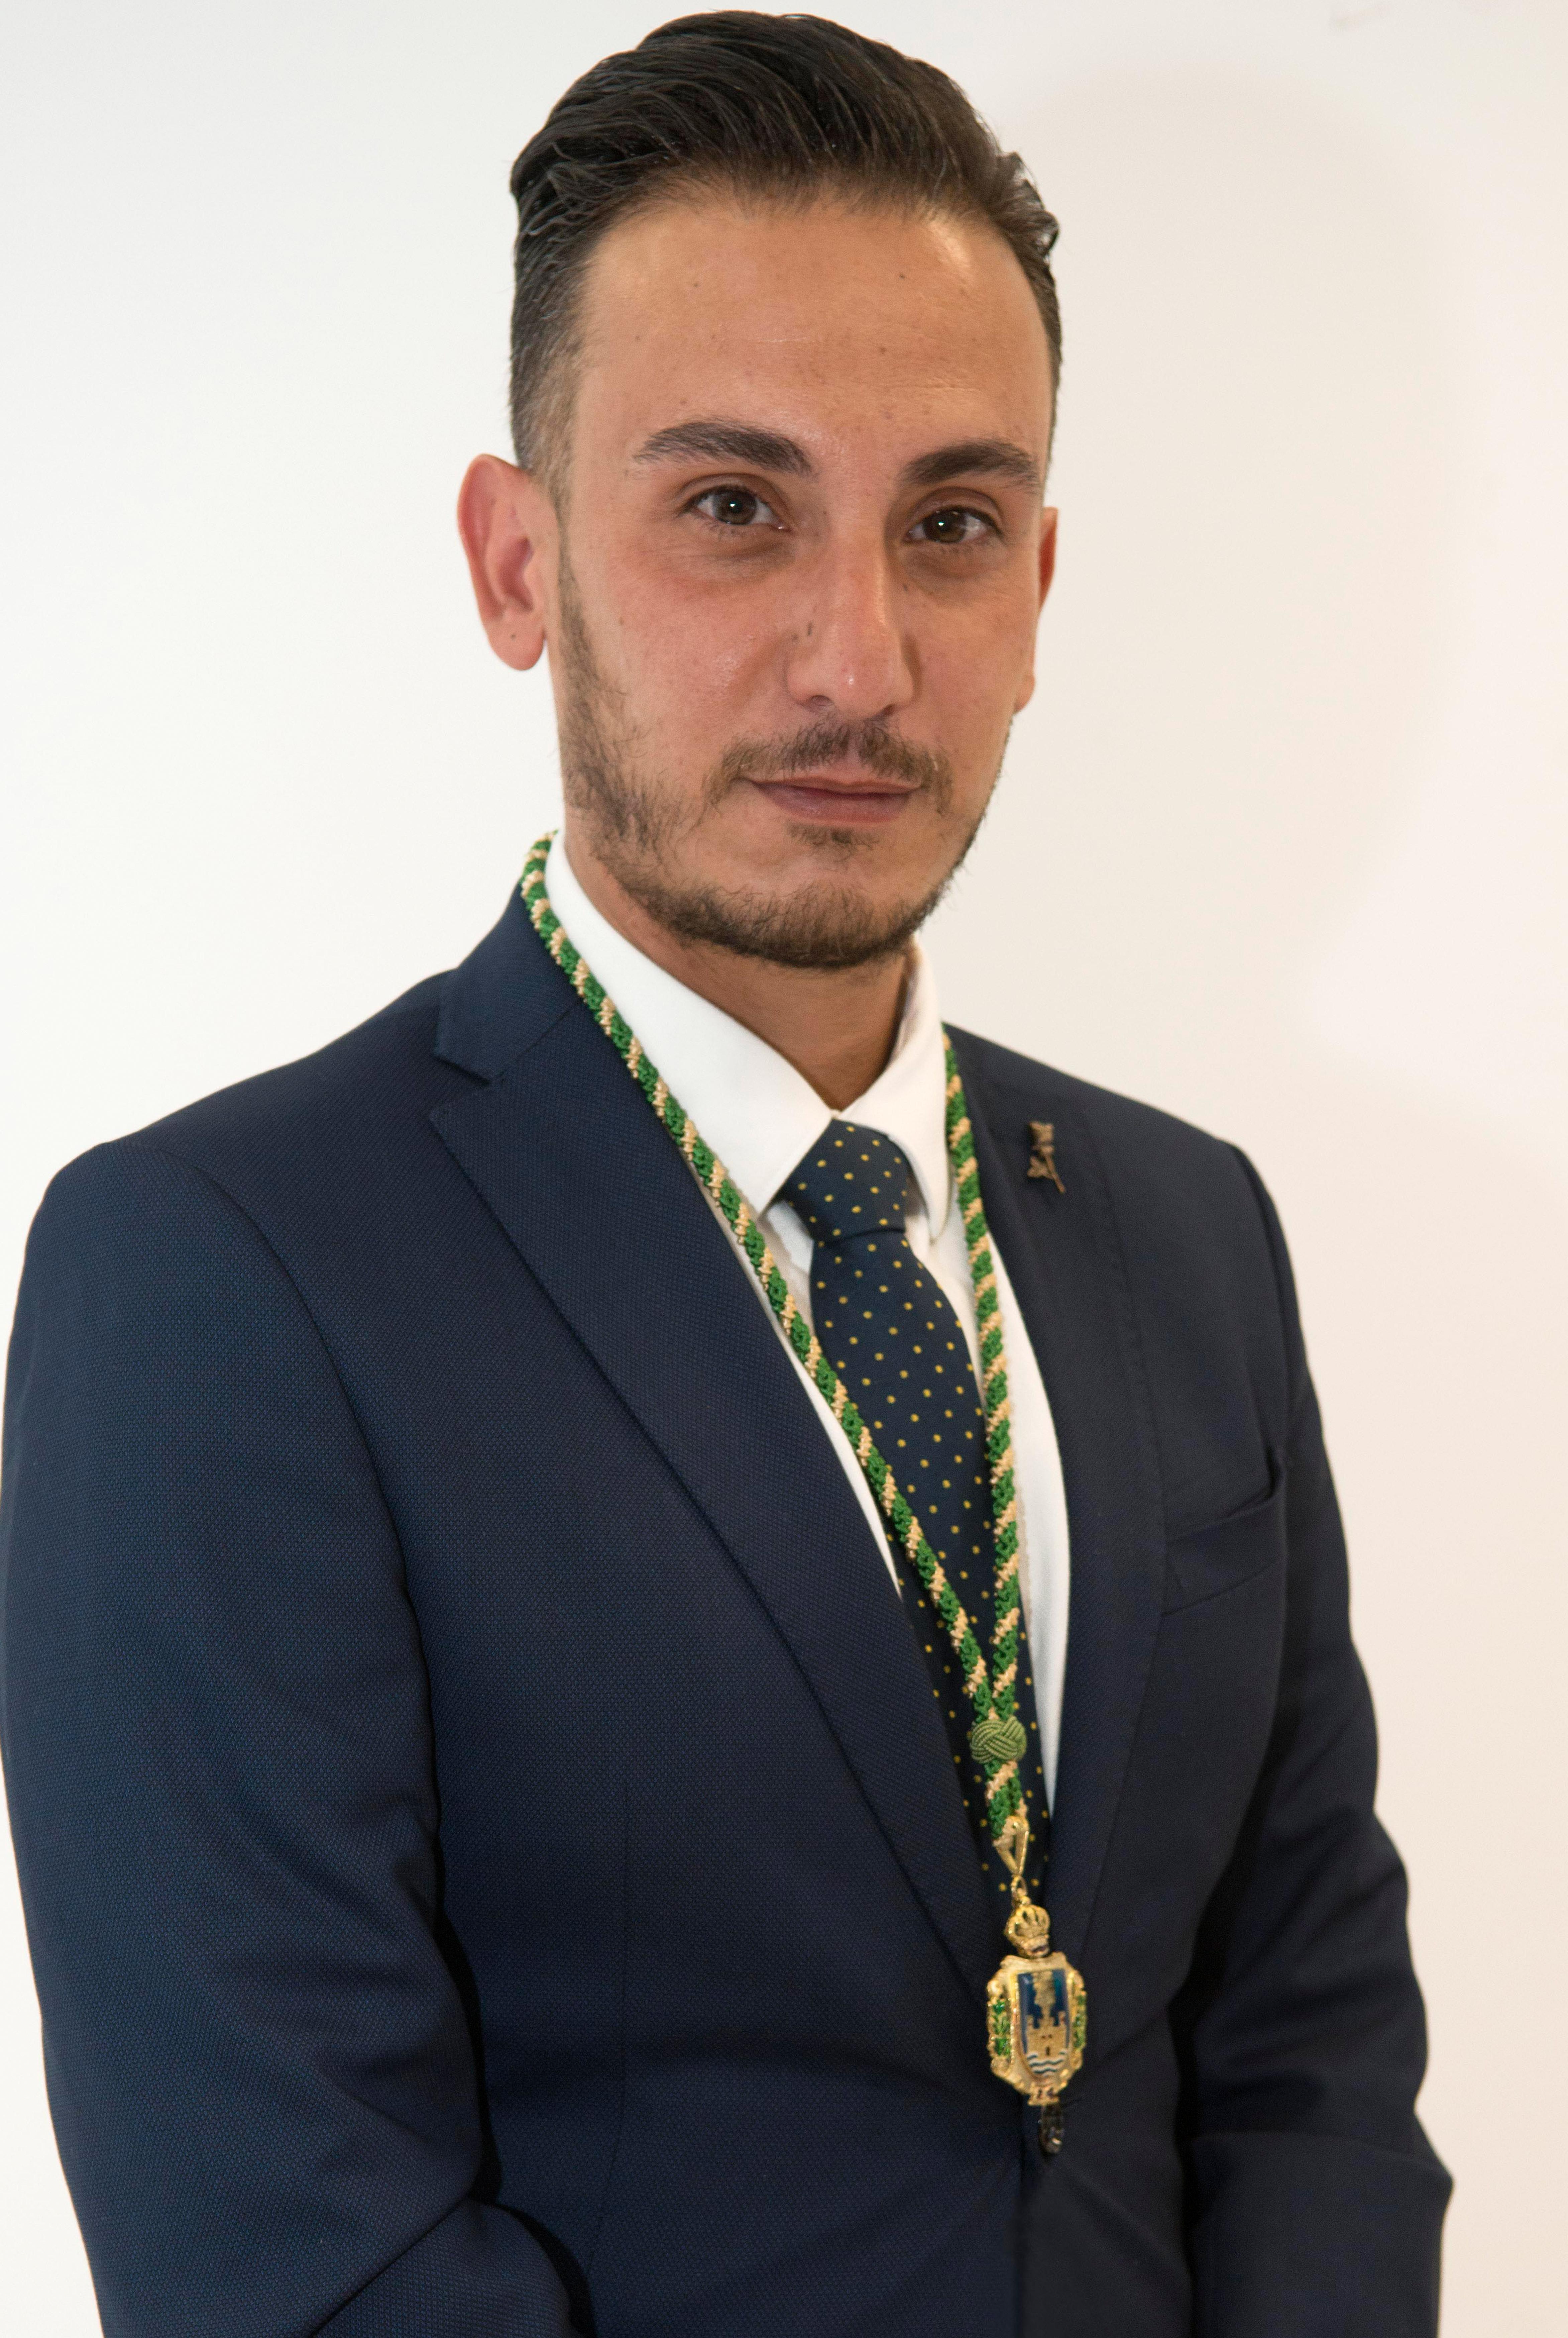 Víctor Manuel Raposo Chaves